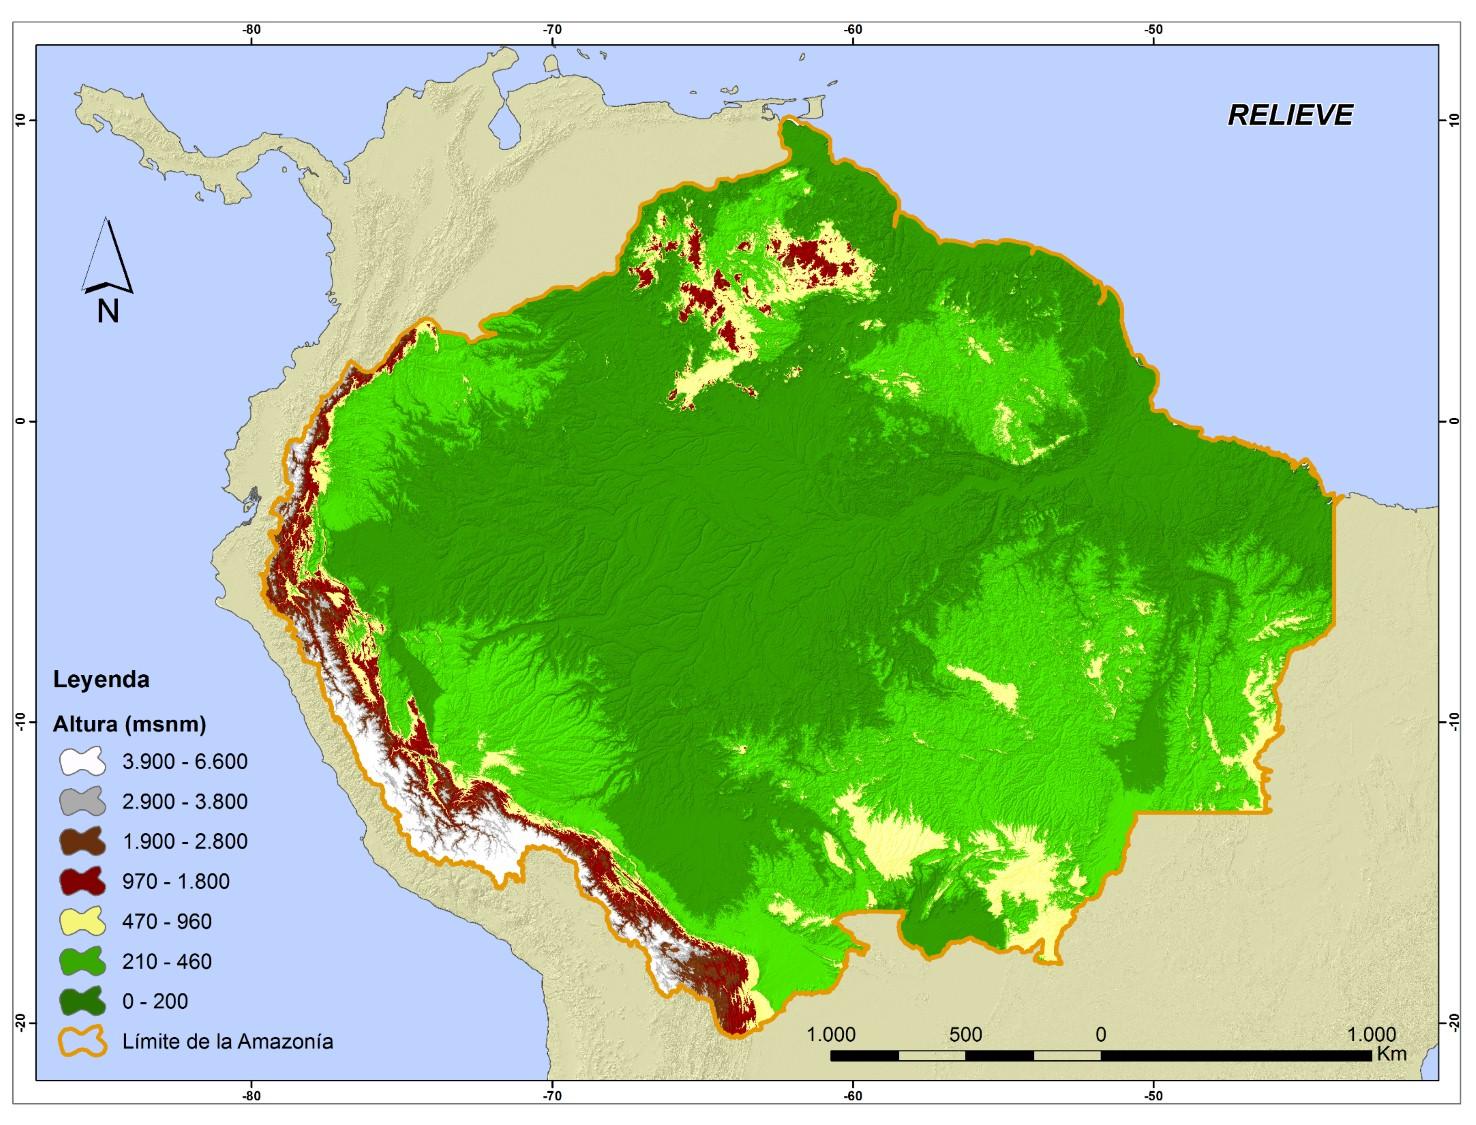 http://177.75.6.227/siigef/public/img/mapa/Imagen_Relieve.jpg